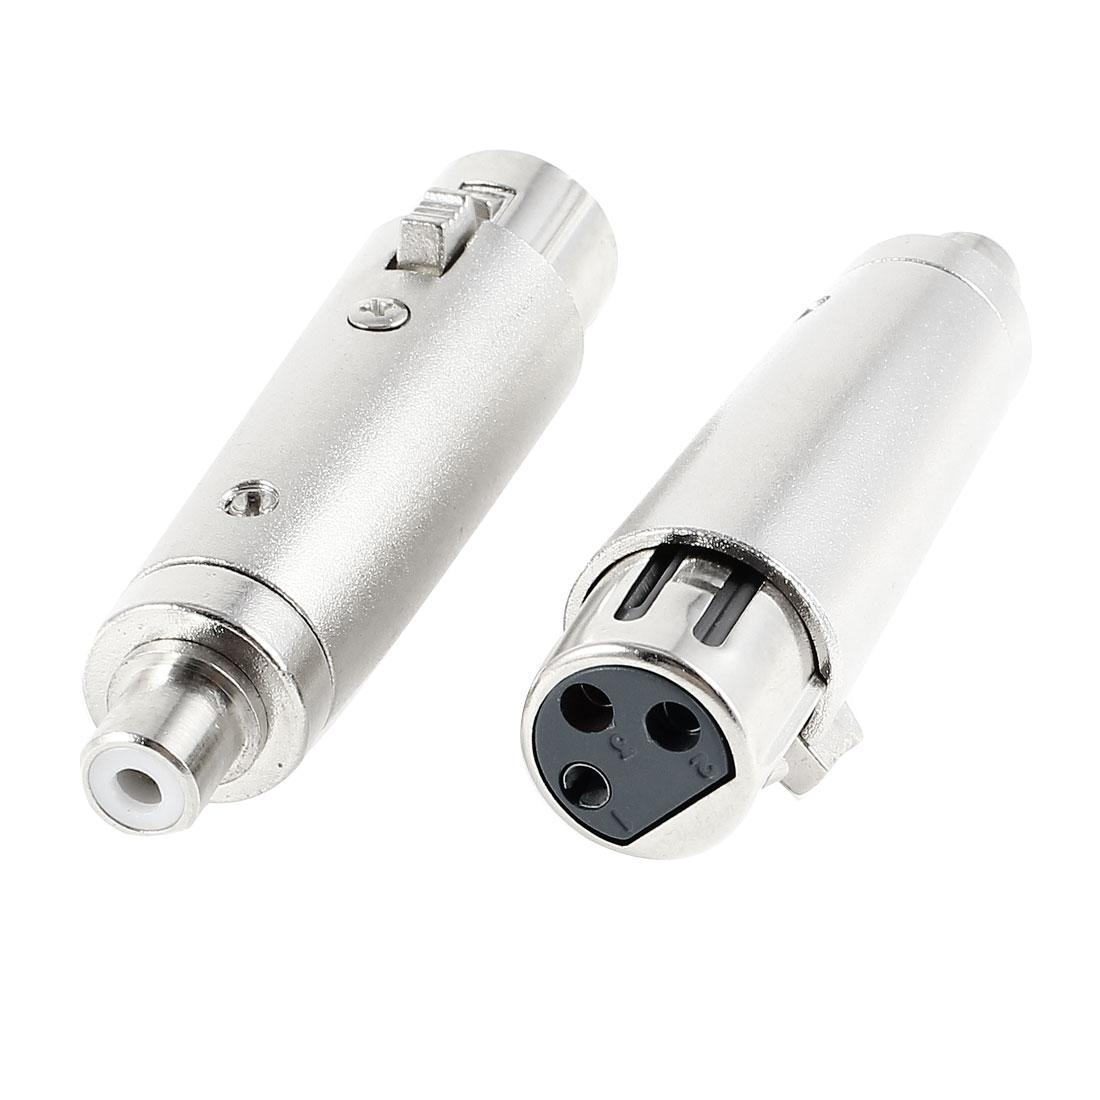 2 Pcs Silver Tone RCA Female Scoket to 3-Pin XLR Female Audio Signal Converter